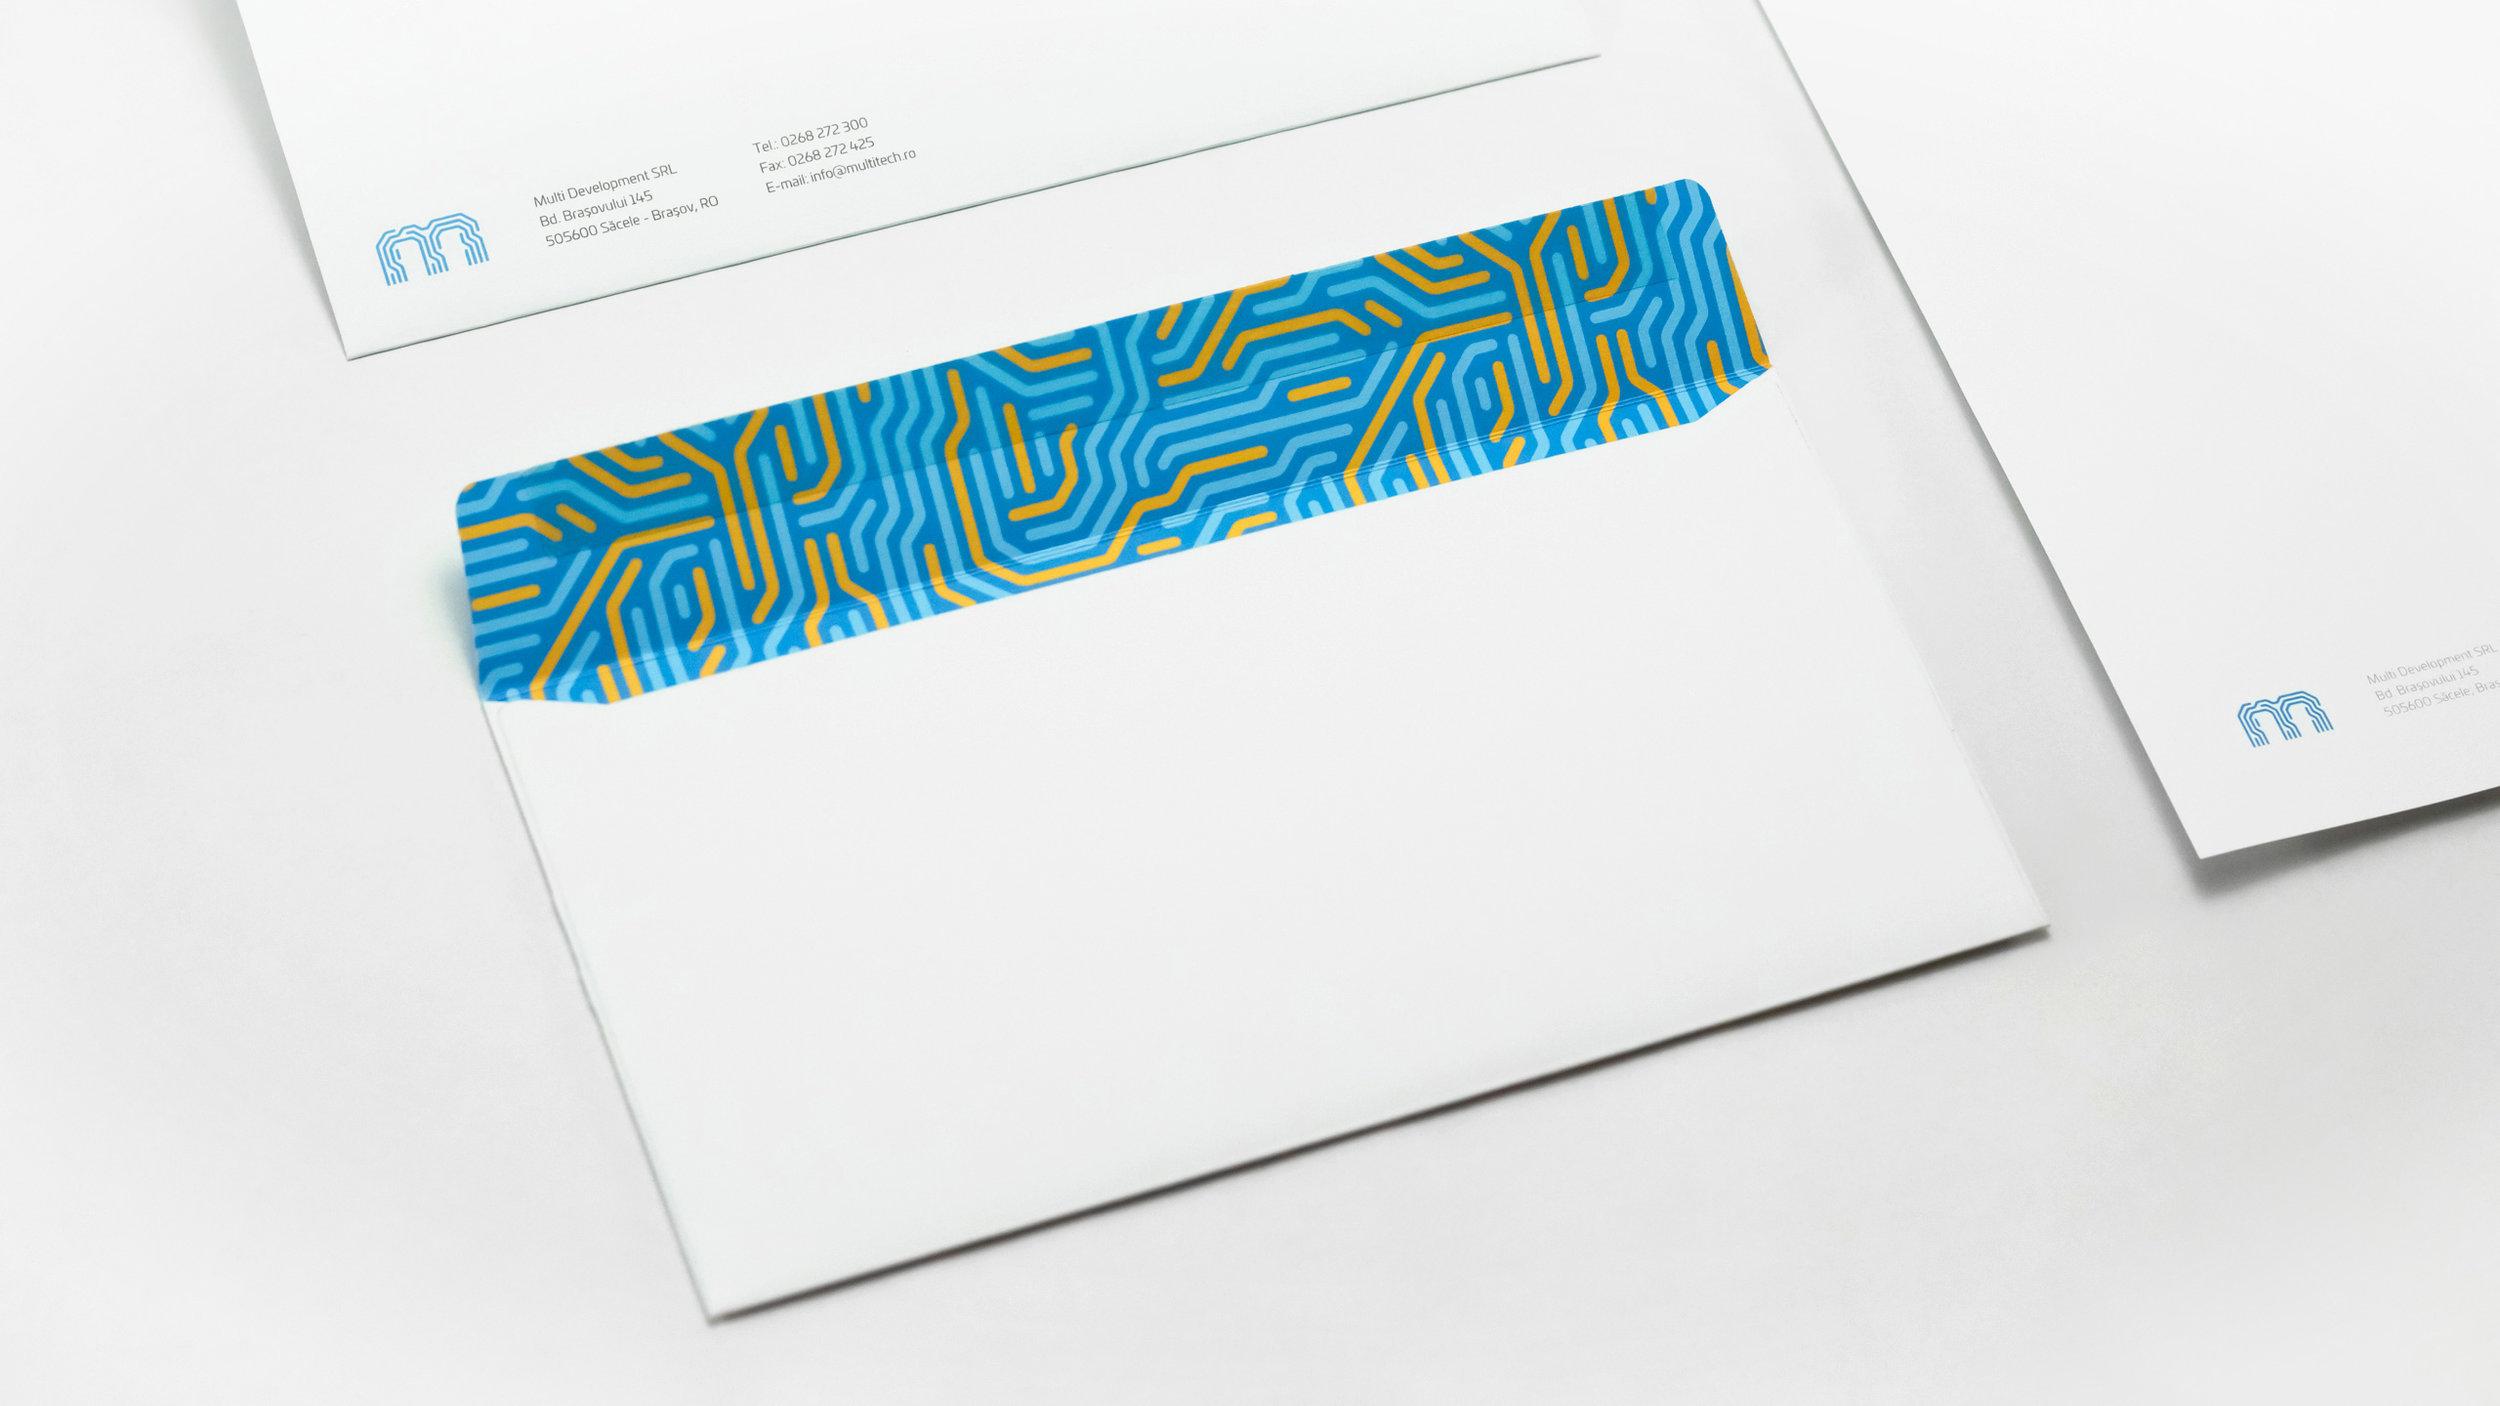 Bisigned - Multitech brand identity design - Stationery design - Envelope